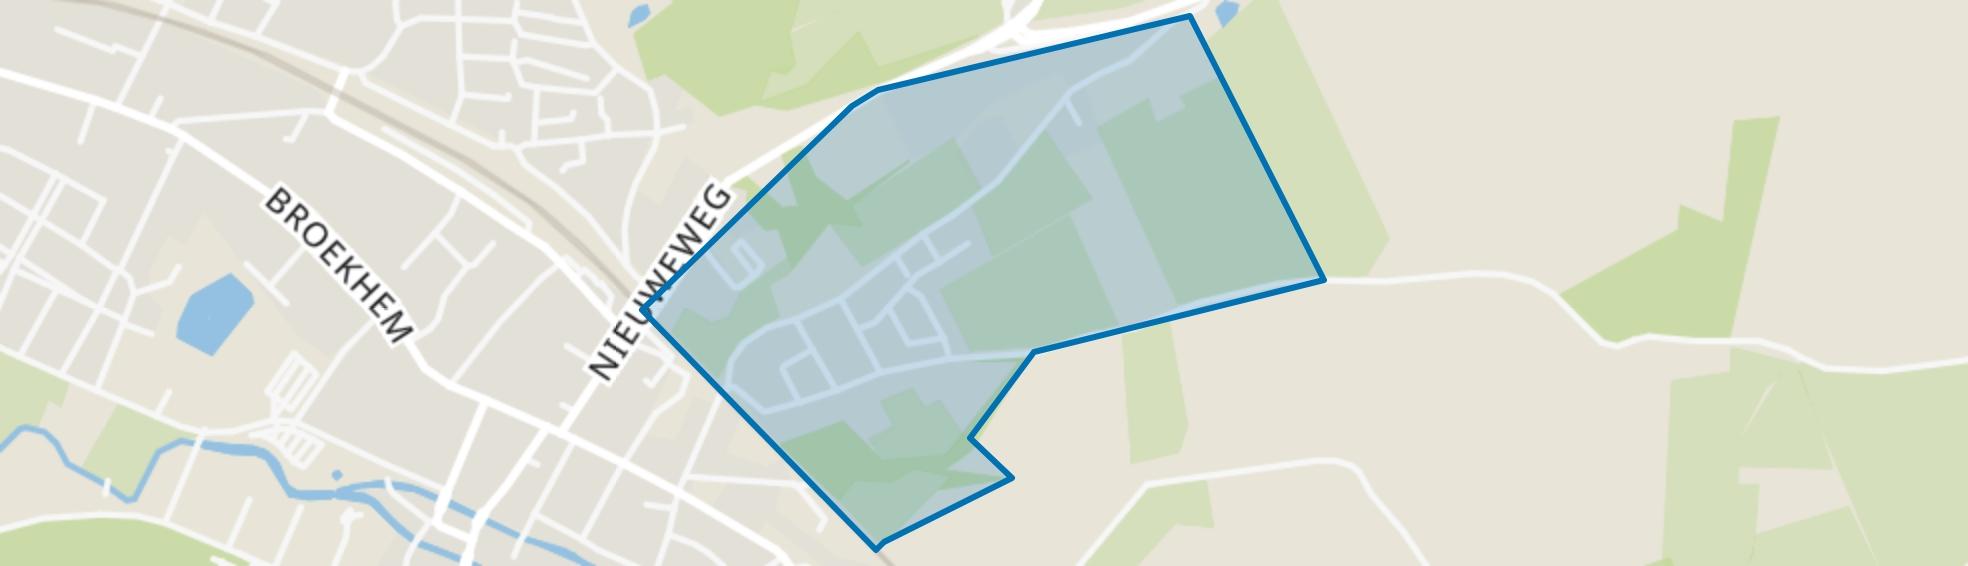 Hekerbeek, Valkenburg (LI) map